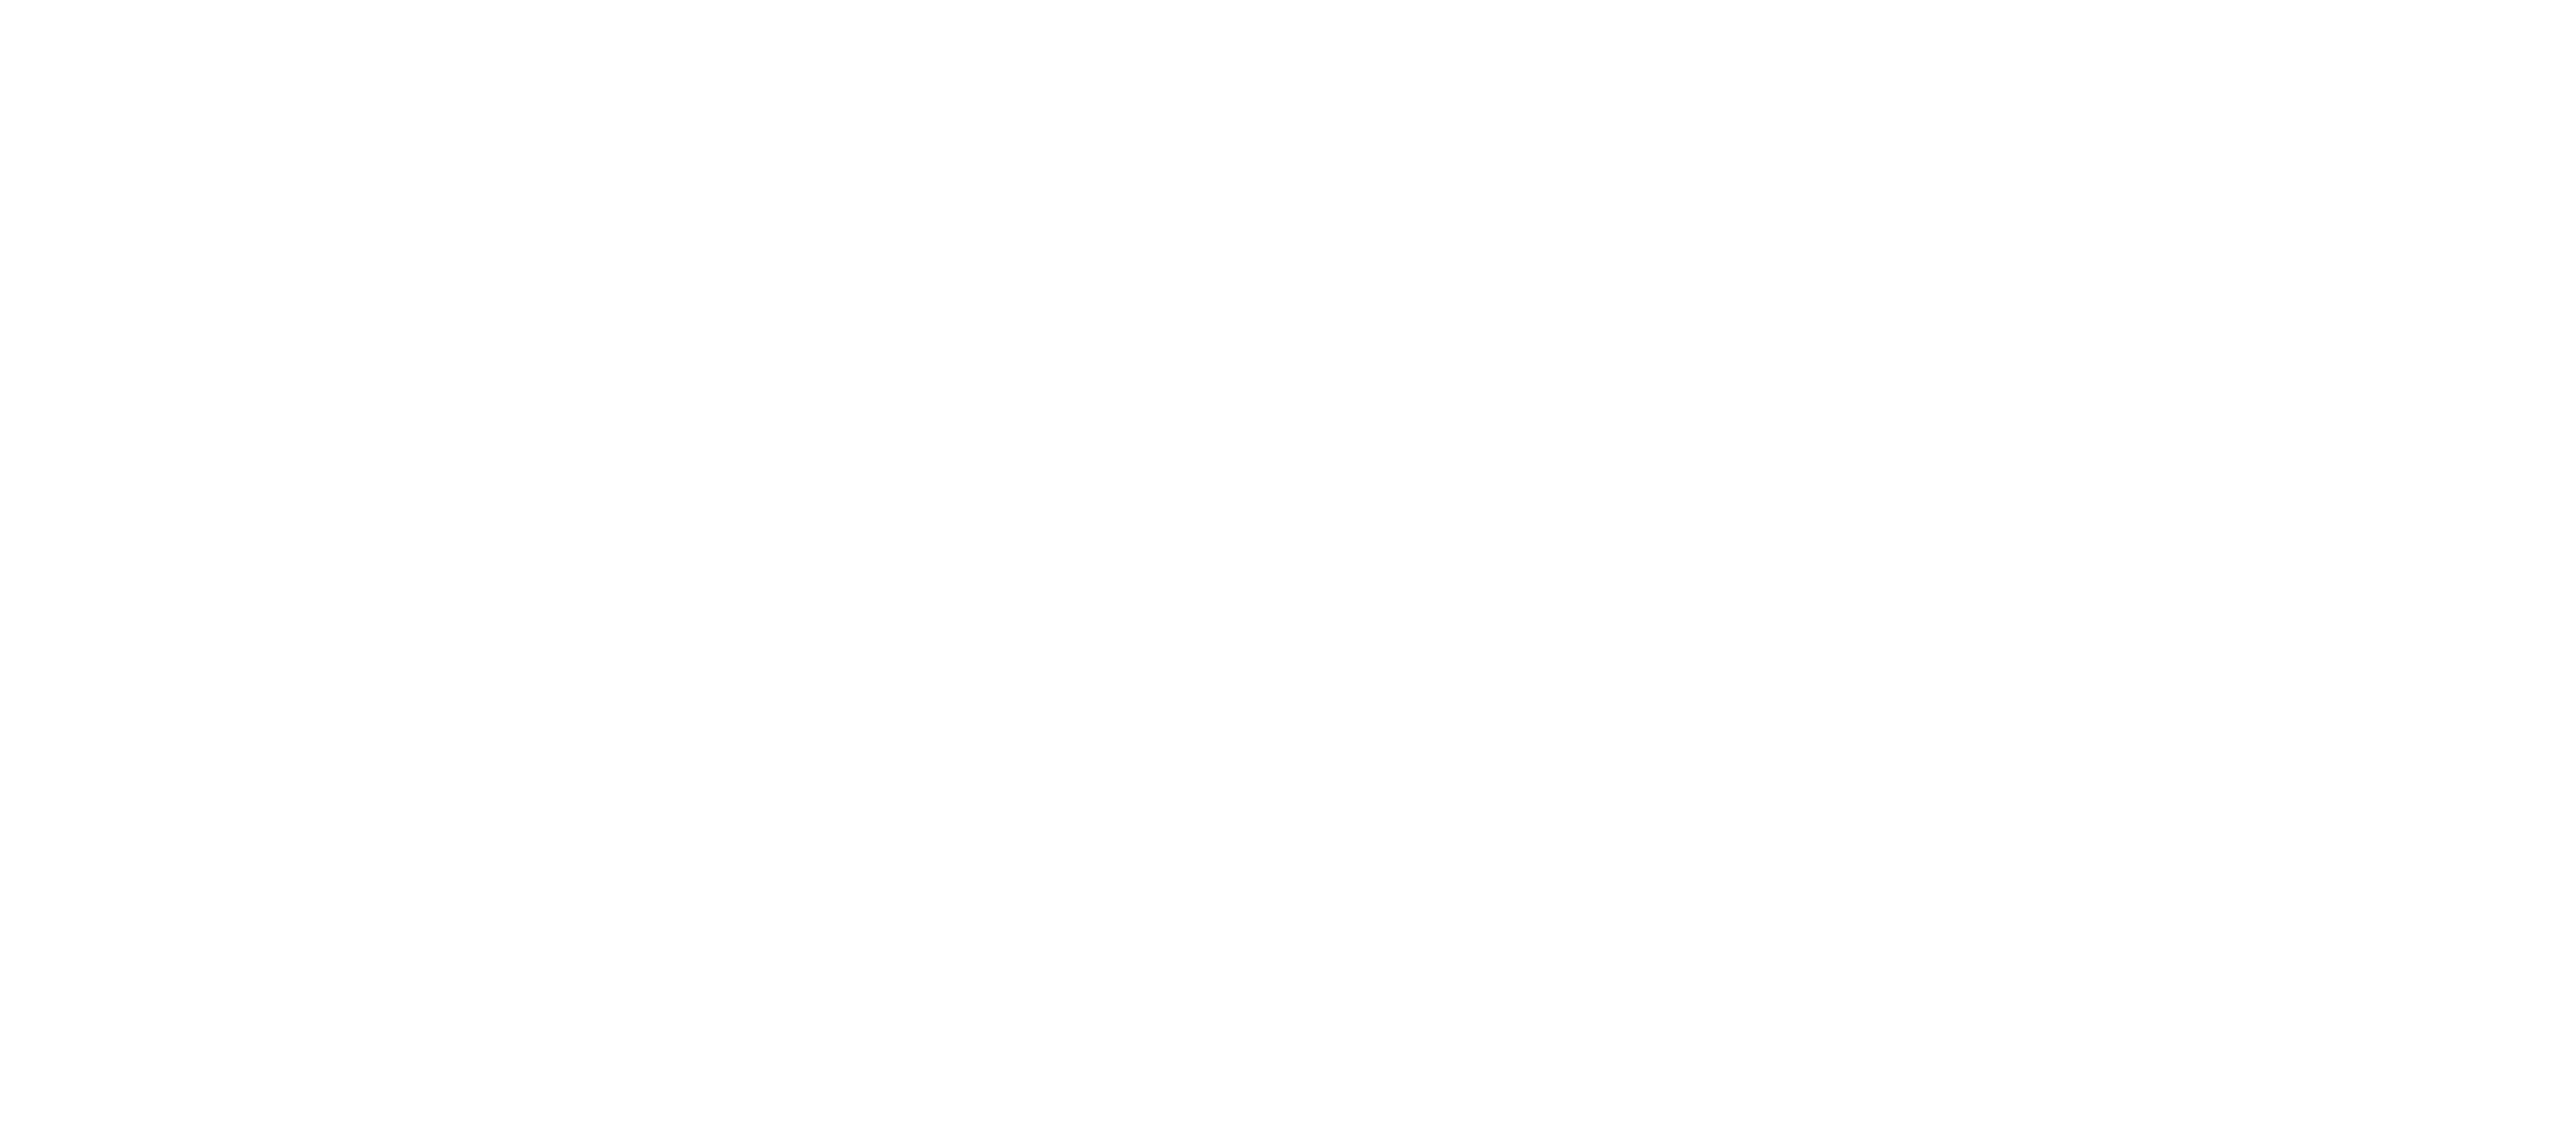 Protectoria / Okay logo